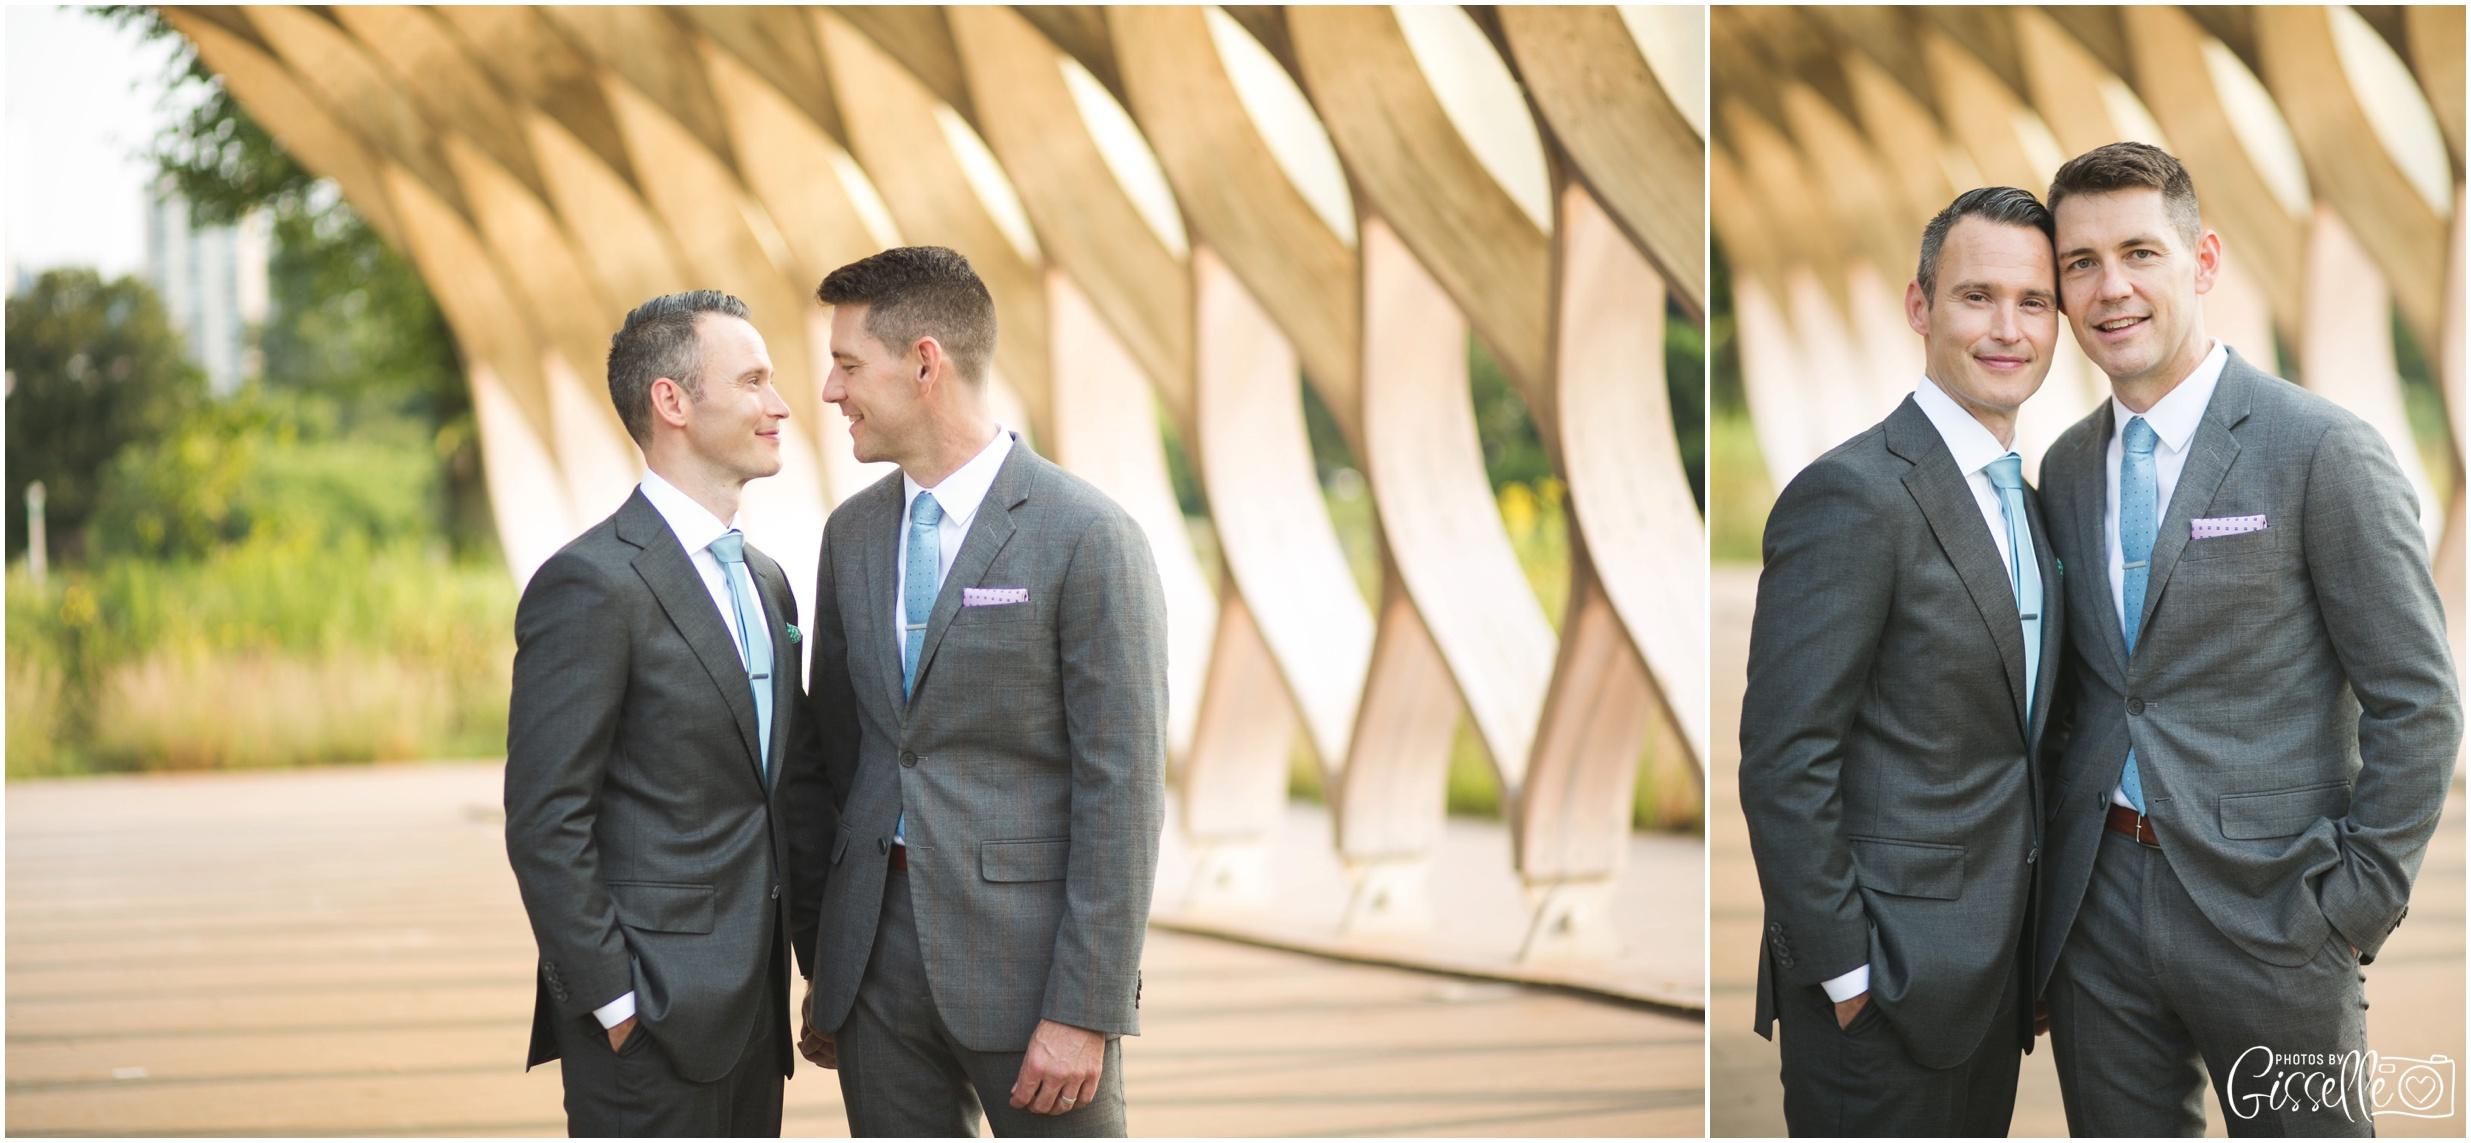 Lincoln Park Wedding_0011.jpg